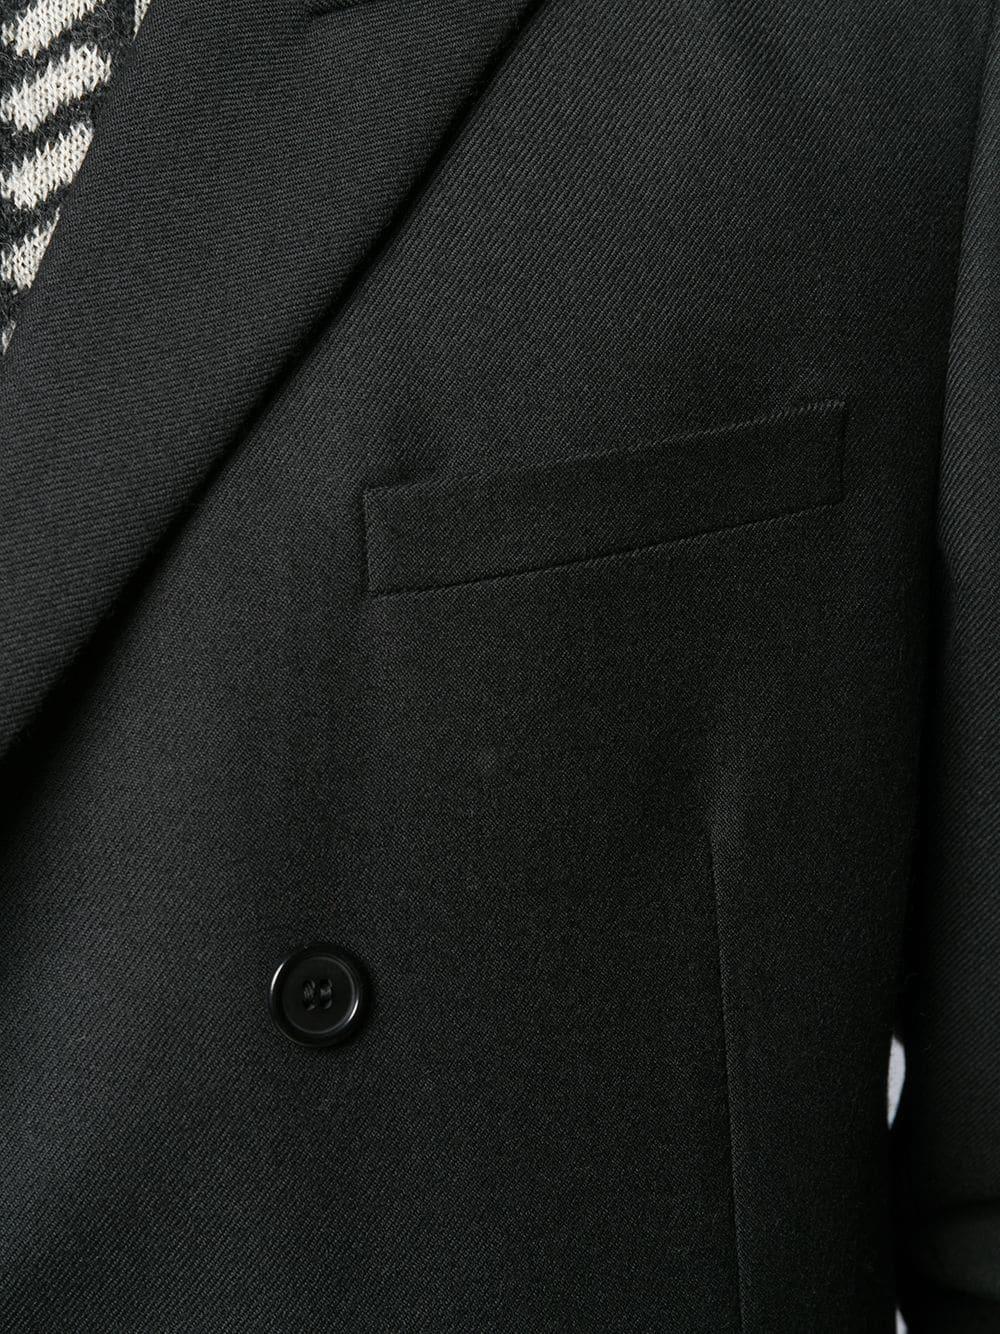 3eeac9d39f5 Black Wool Double-Breasted Jacket - SAINT LAURENT - Russocapri